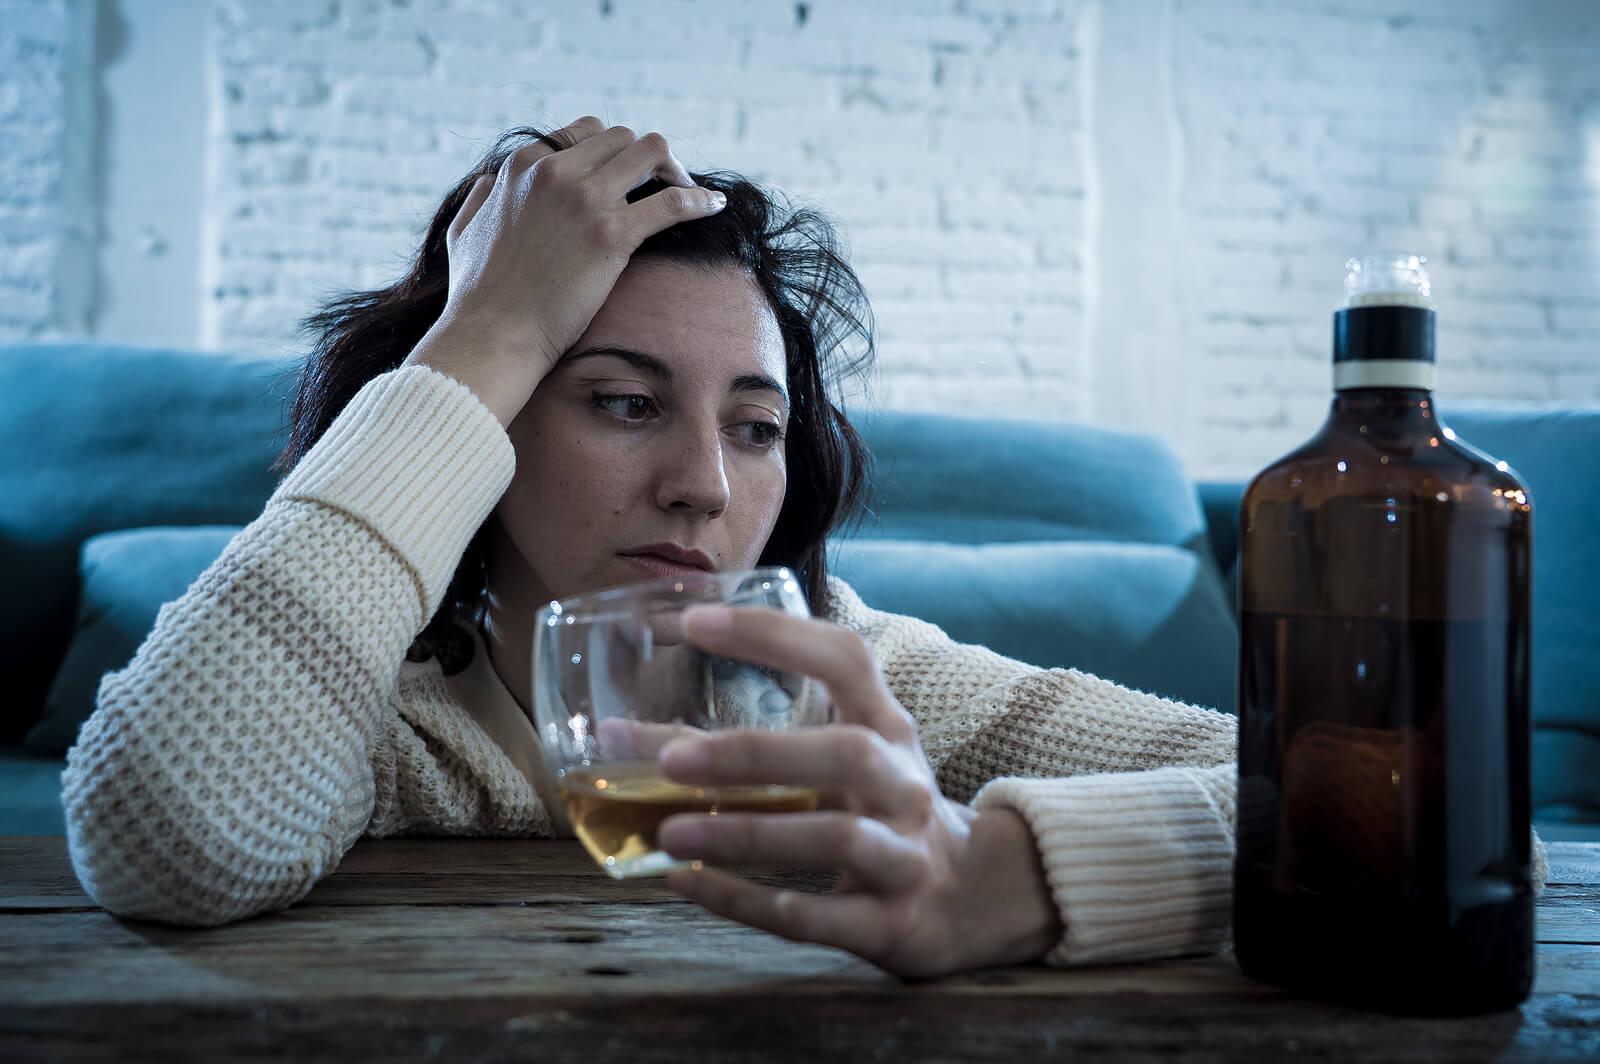 Mujer bebiendo alcohol sin parar; sufre alcoholismo materno.